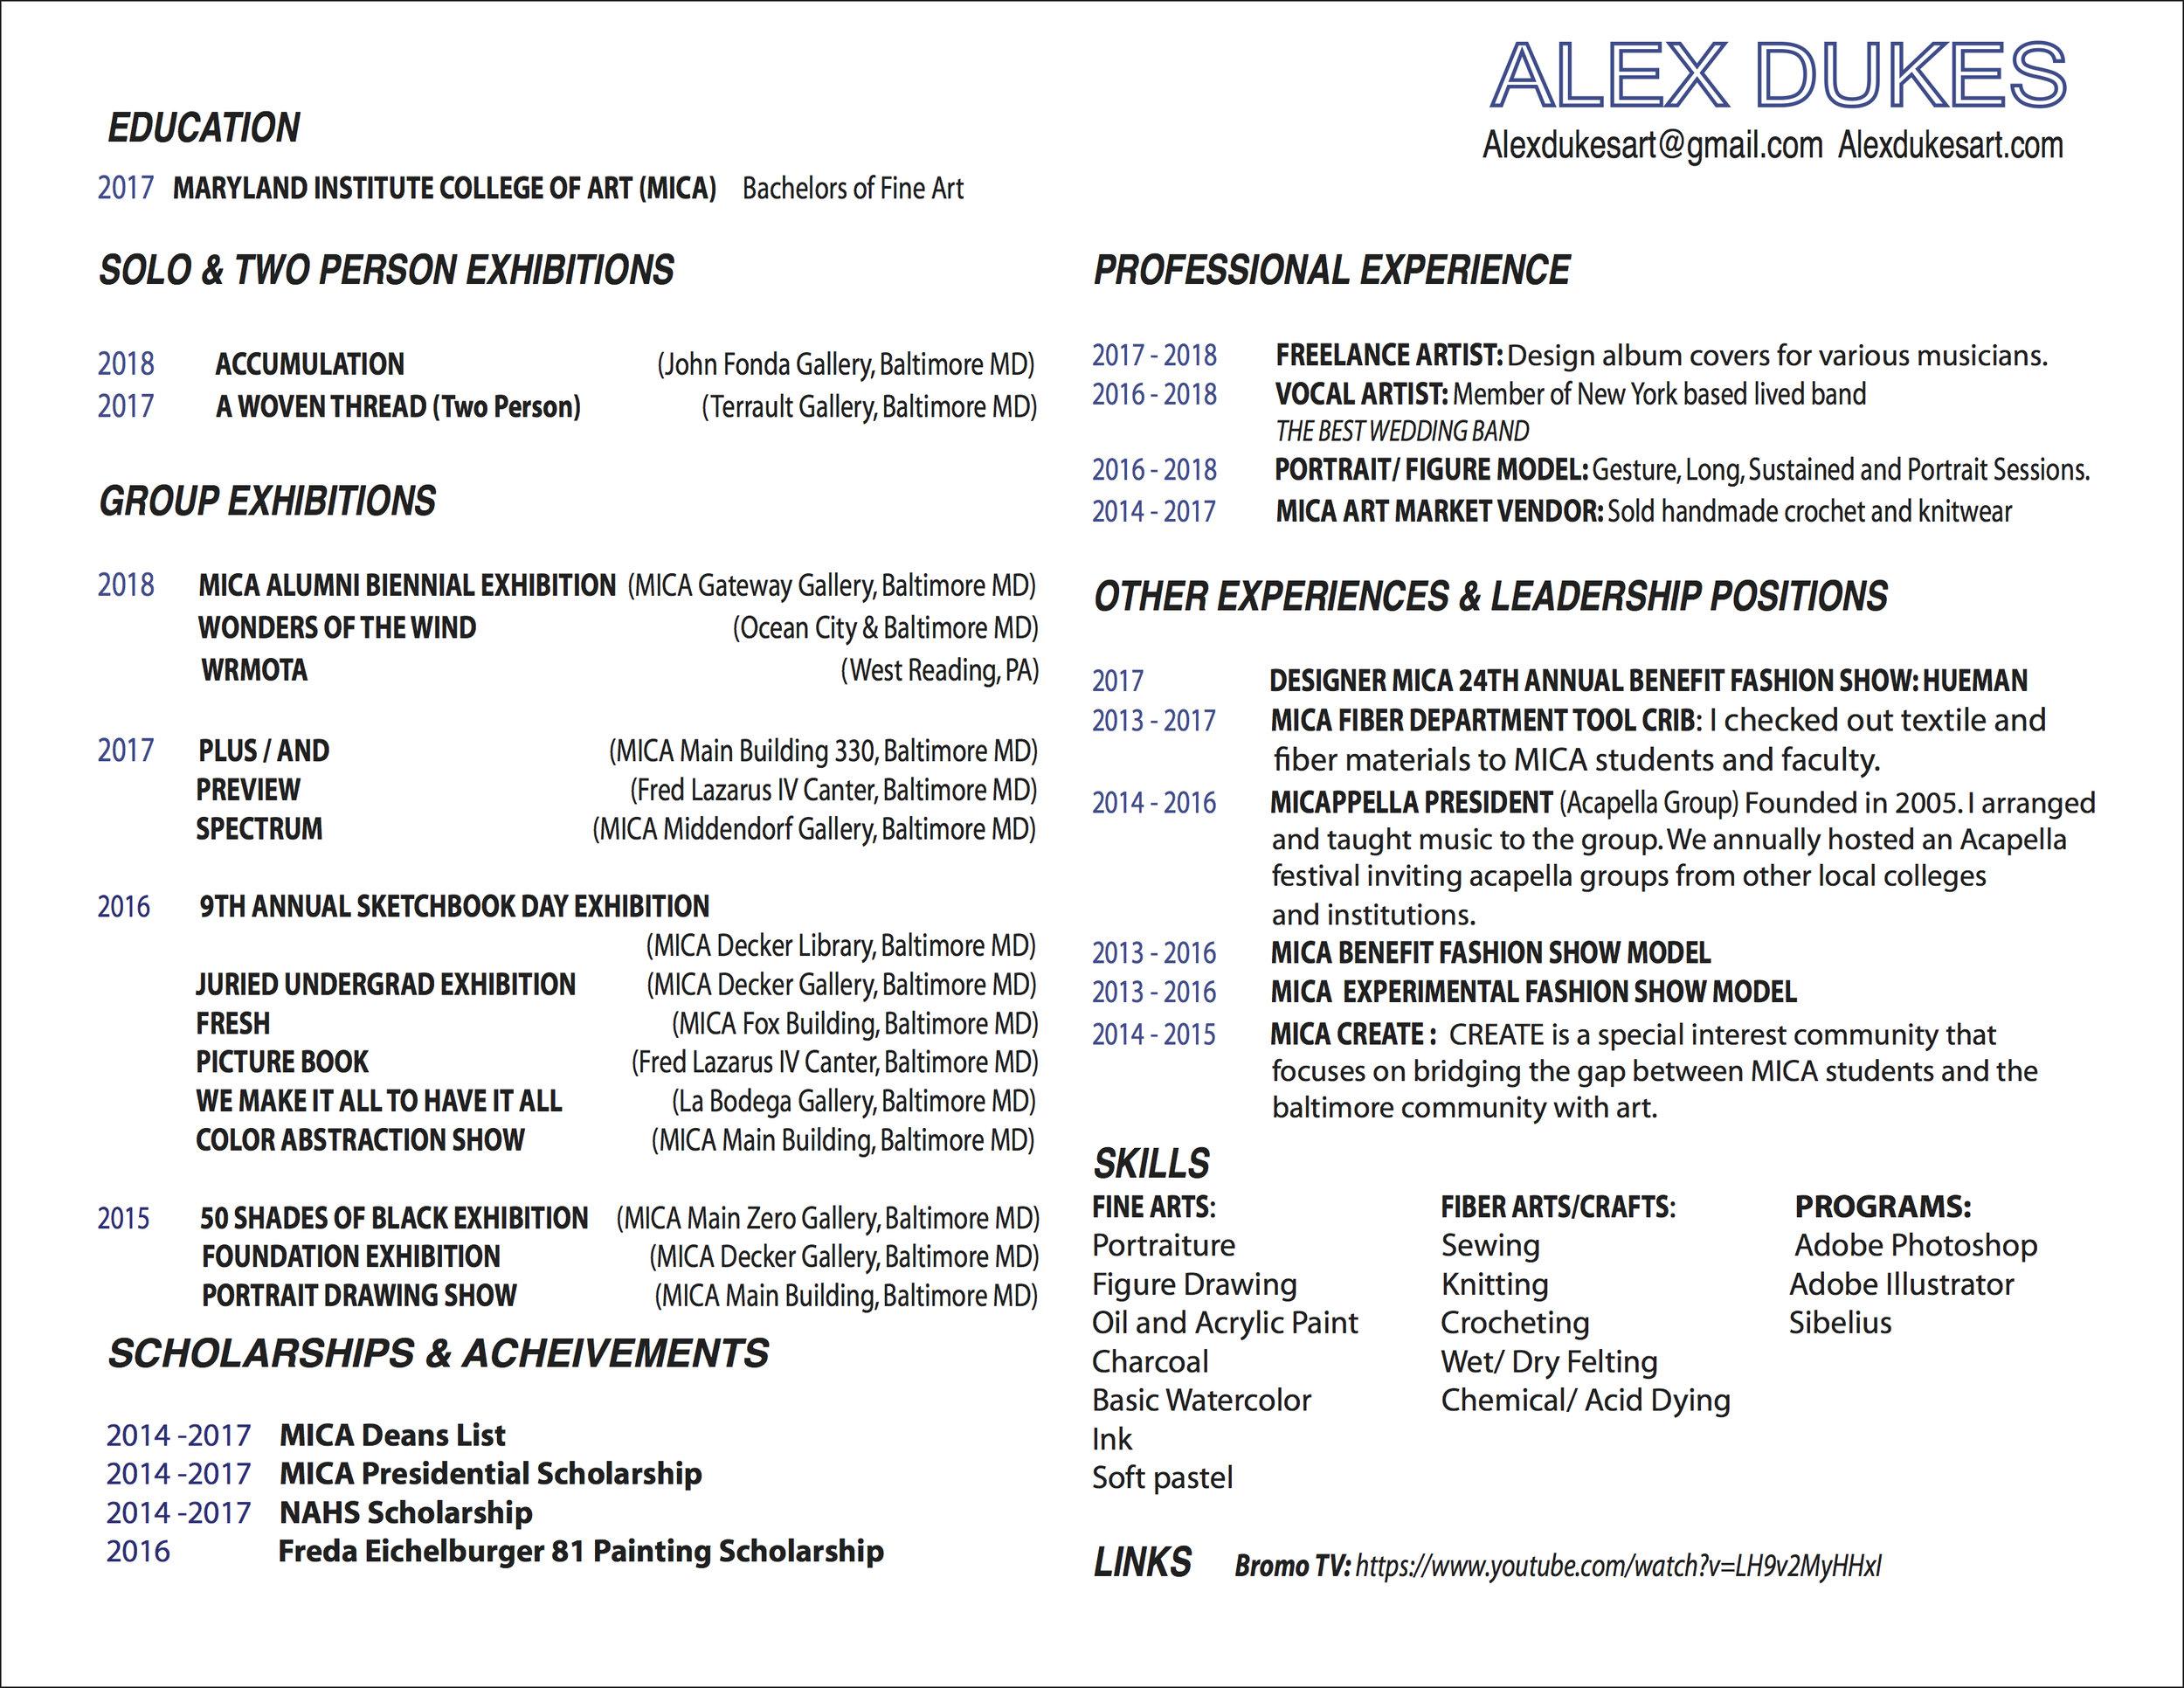 Resume 7-24-18.jpg